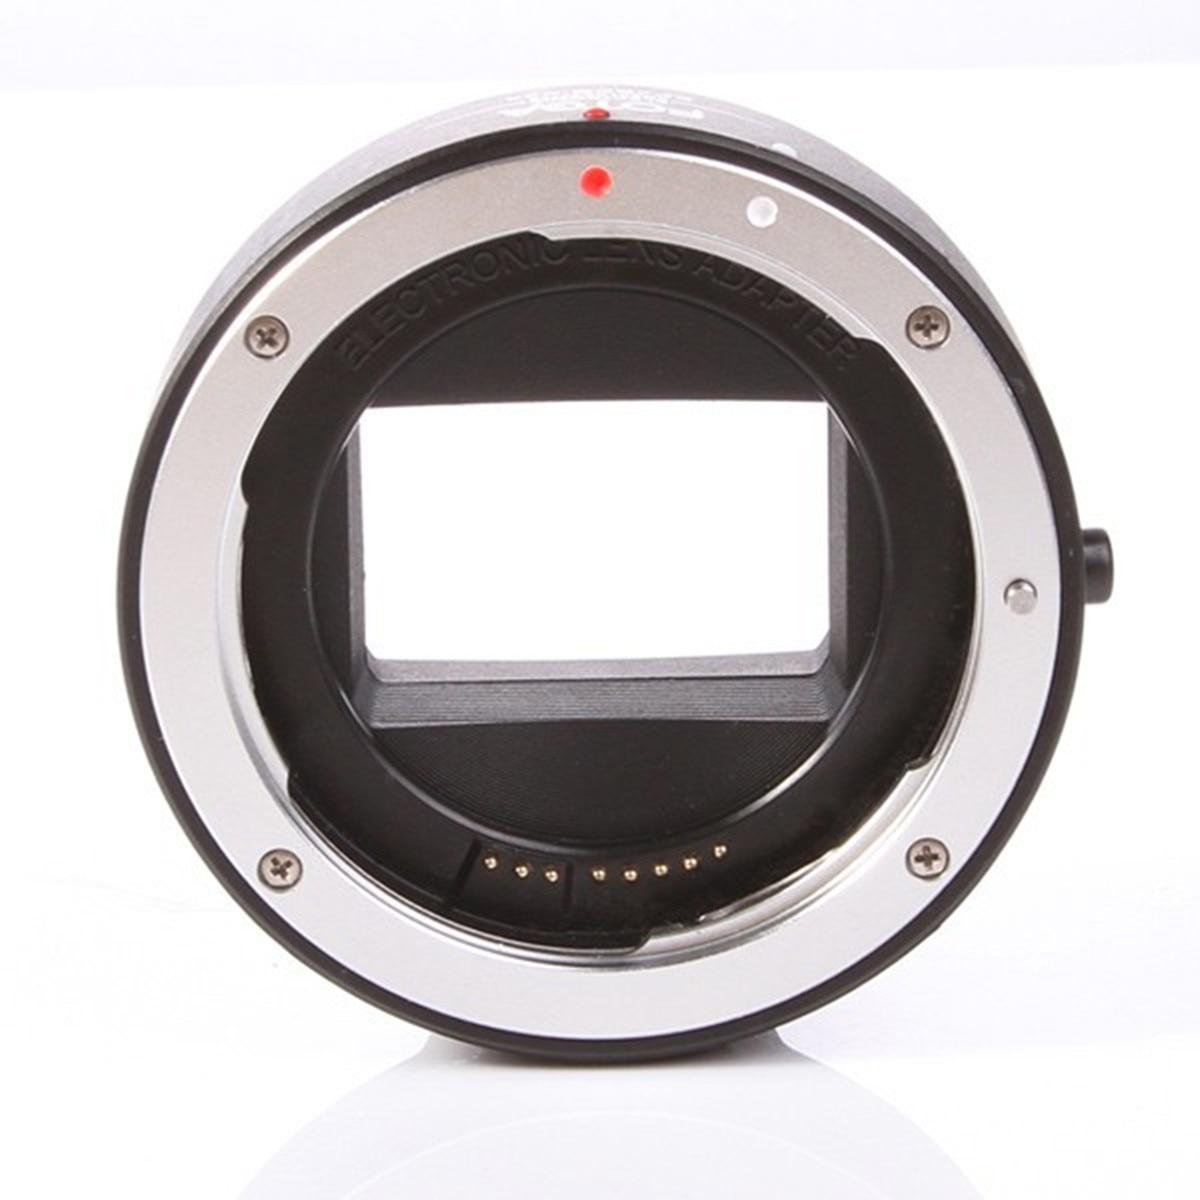 FOTGA Electronic AF Auto Focus Lens Adapter Ring for Canon EOS EF EF-S to Sony E NEX A7 A7R A7S A9 A6300 A6500 lens Full Frame fotga auto focus af for canon ef ef s eos lens to sony nex e mount adapter ring